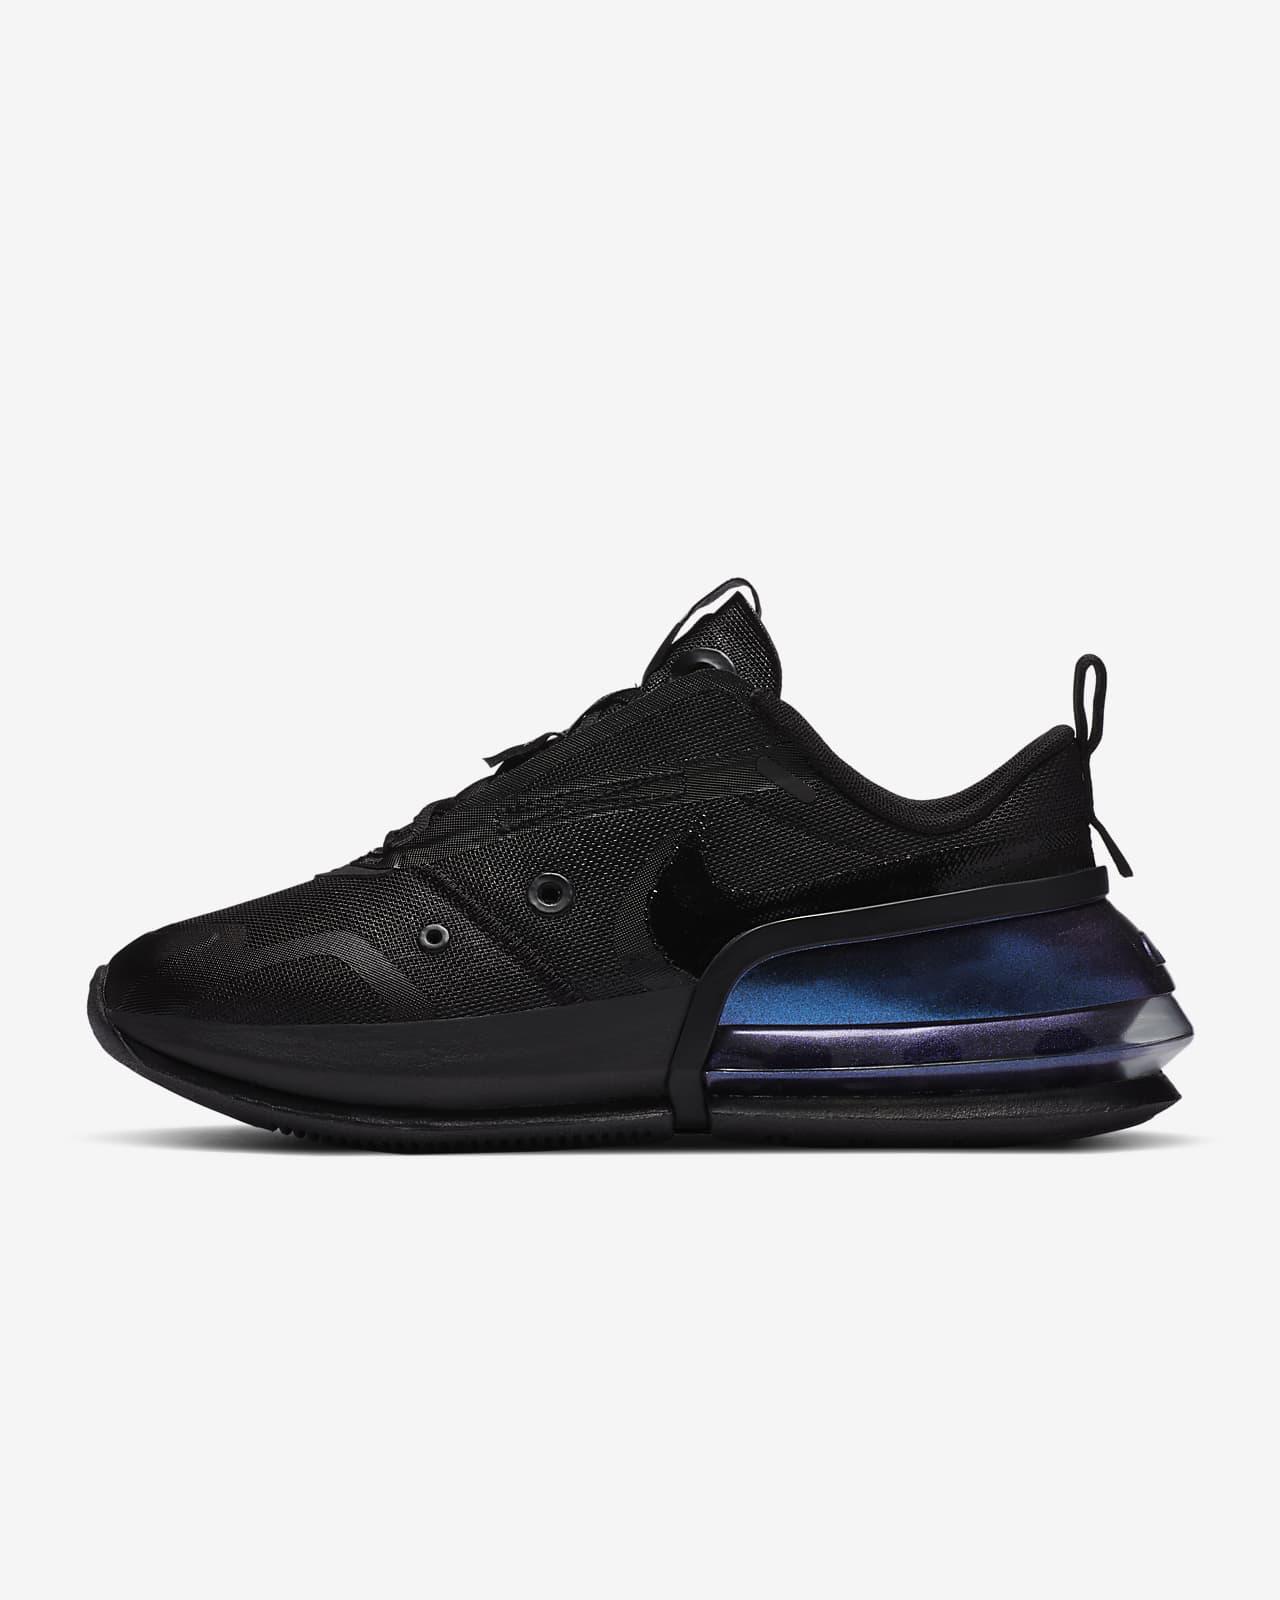 Chaussure Nike Air Max Up NRG pour Femme